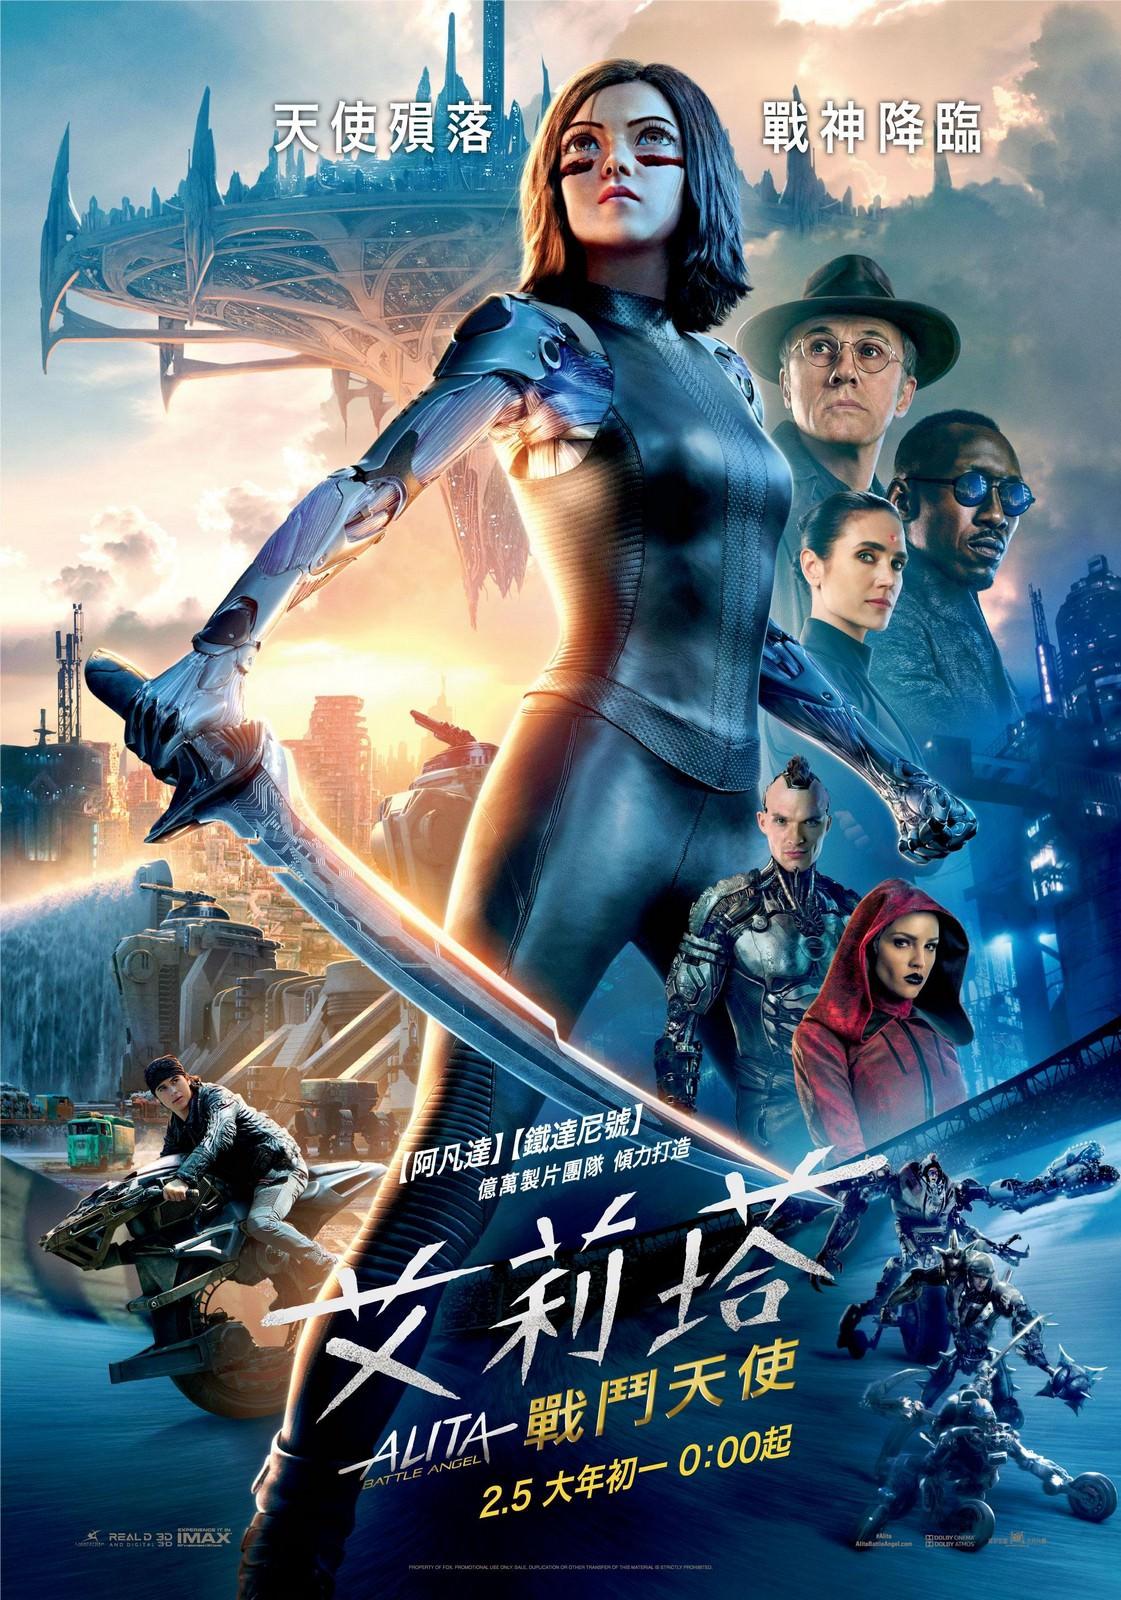 Movie, 艾莉塔:戰鬥天使 / Alita: Battle Angel(美國, 2019年) / 阿丽塔:战斗天使(中國) / 銃夢:戰鬥天使(香港), 電影海報, 台灣